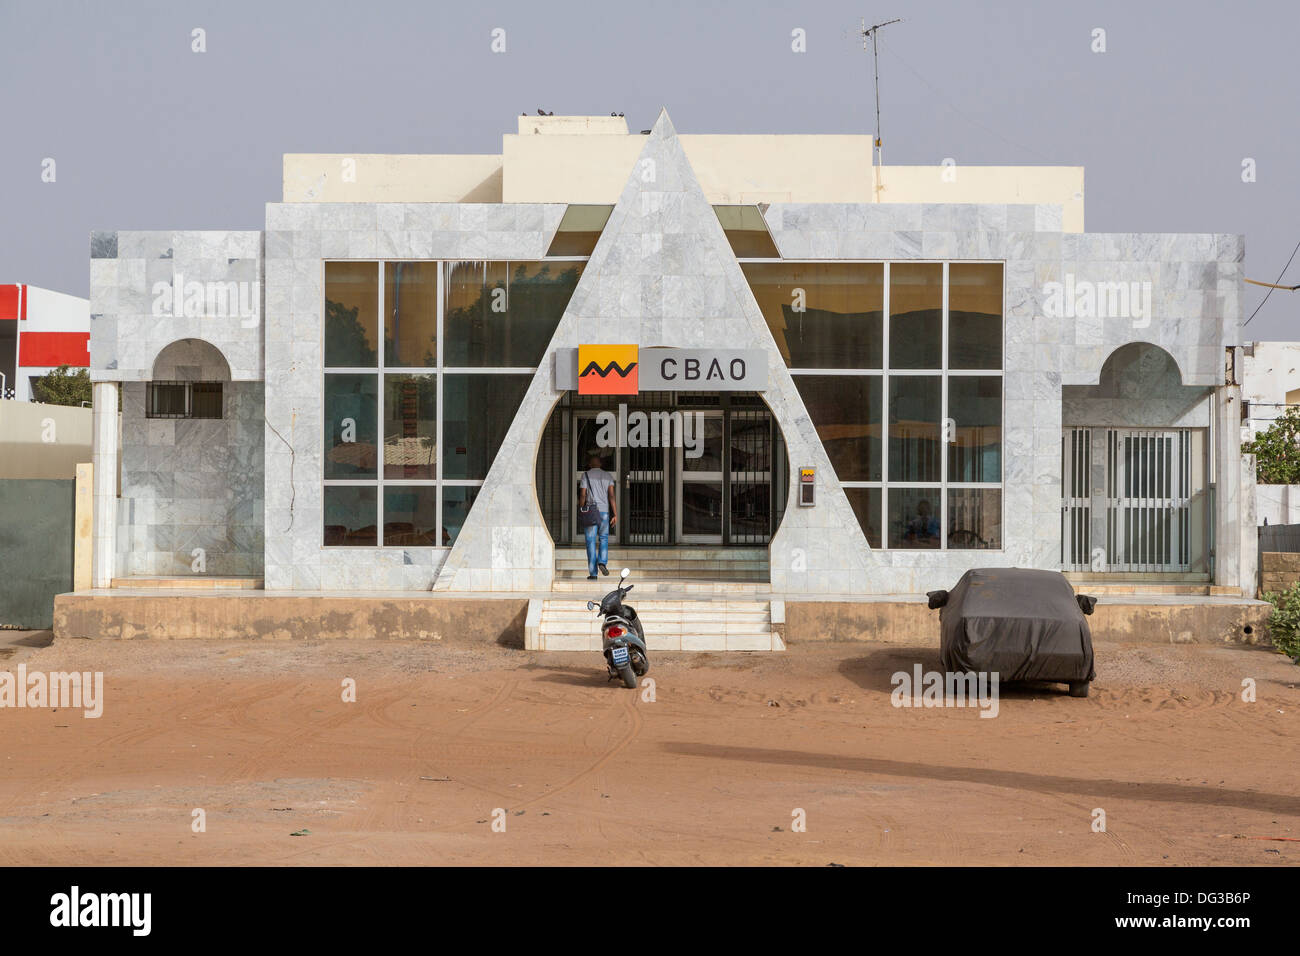 Senegal, Touba. Man Entering CBAO, a Private Bank Headquartered in Dakar. (Compagnie Bancaire de l'Afrique Occidentale). - Stock Image